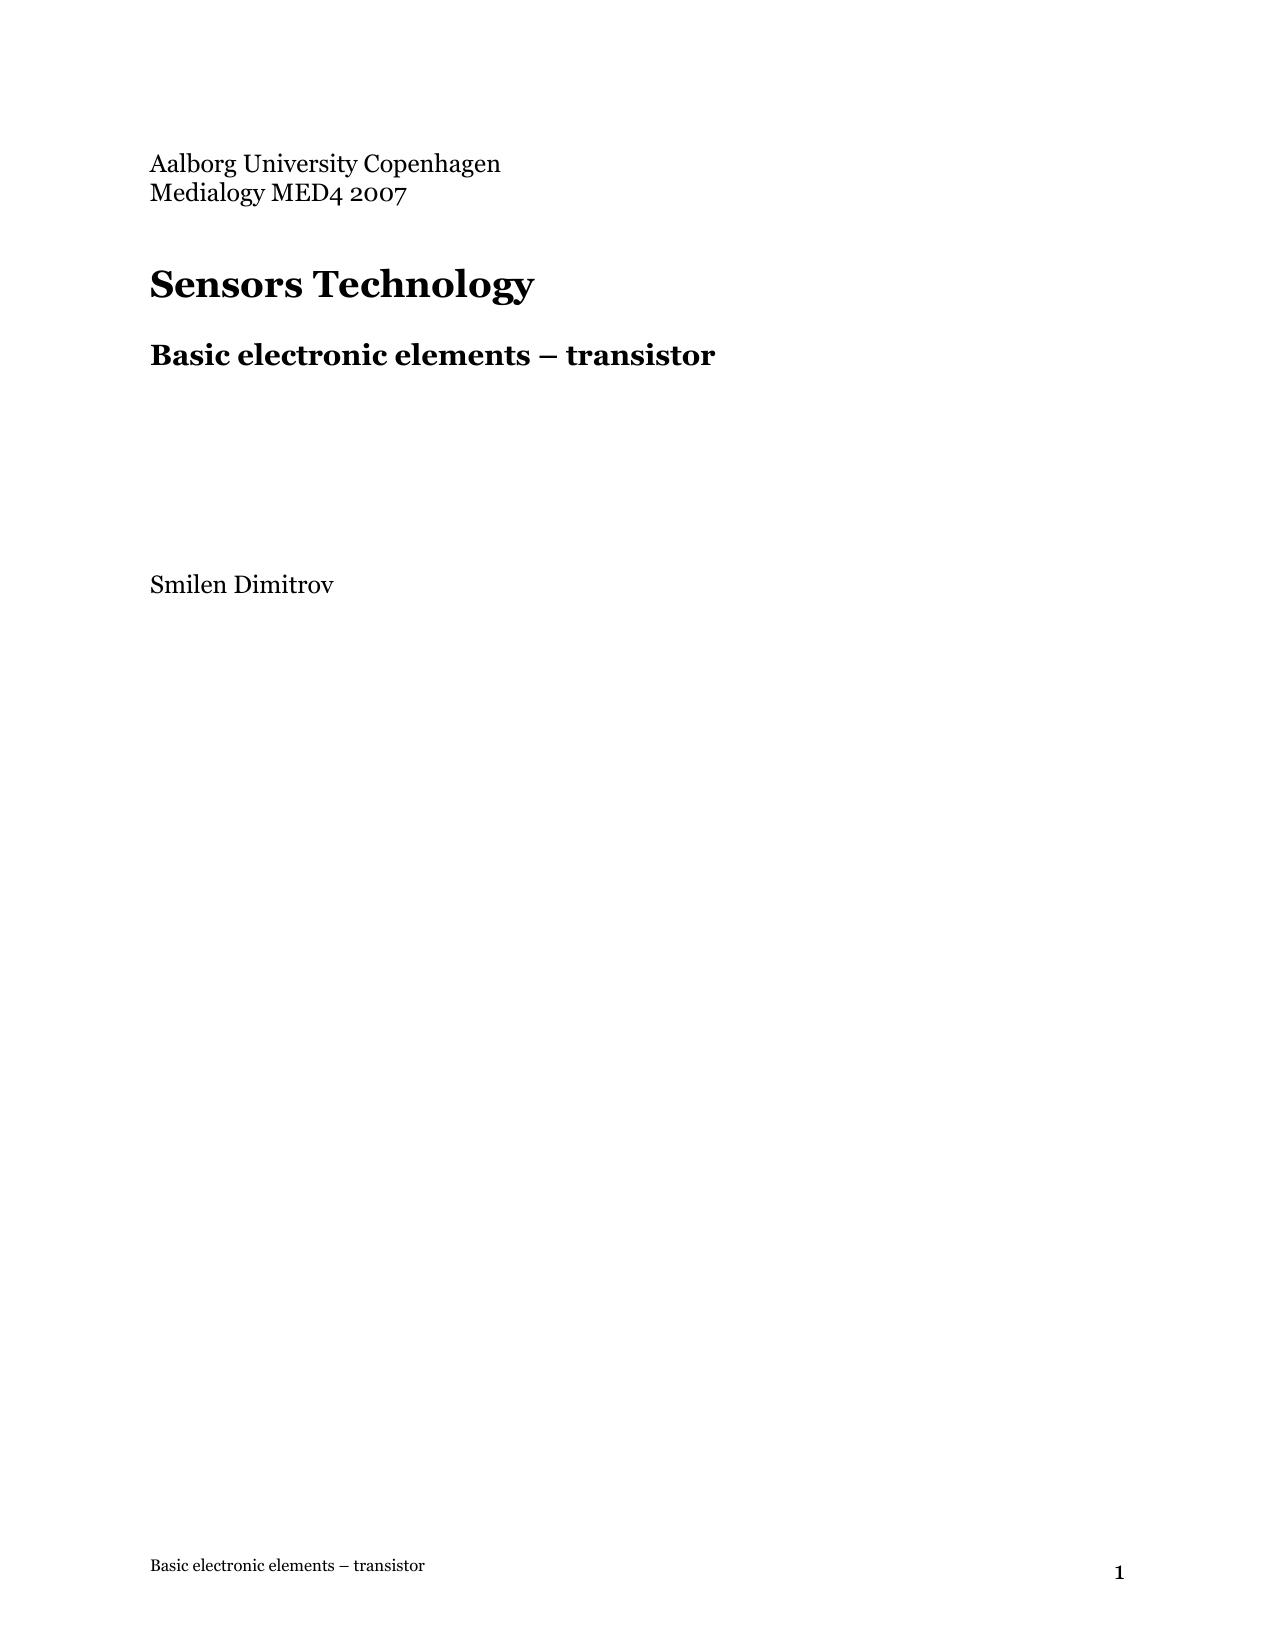 Transistors Input And Output Coupling Bipolar Junction Electronics